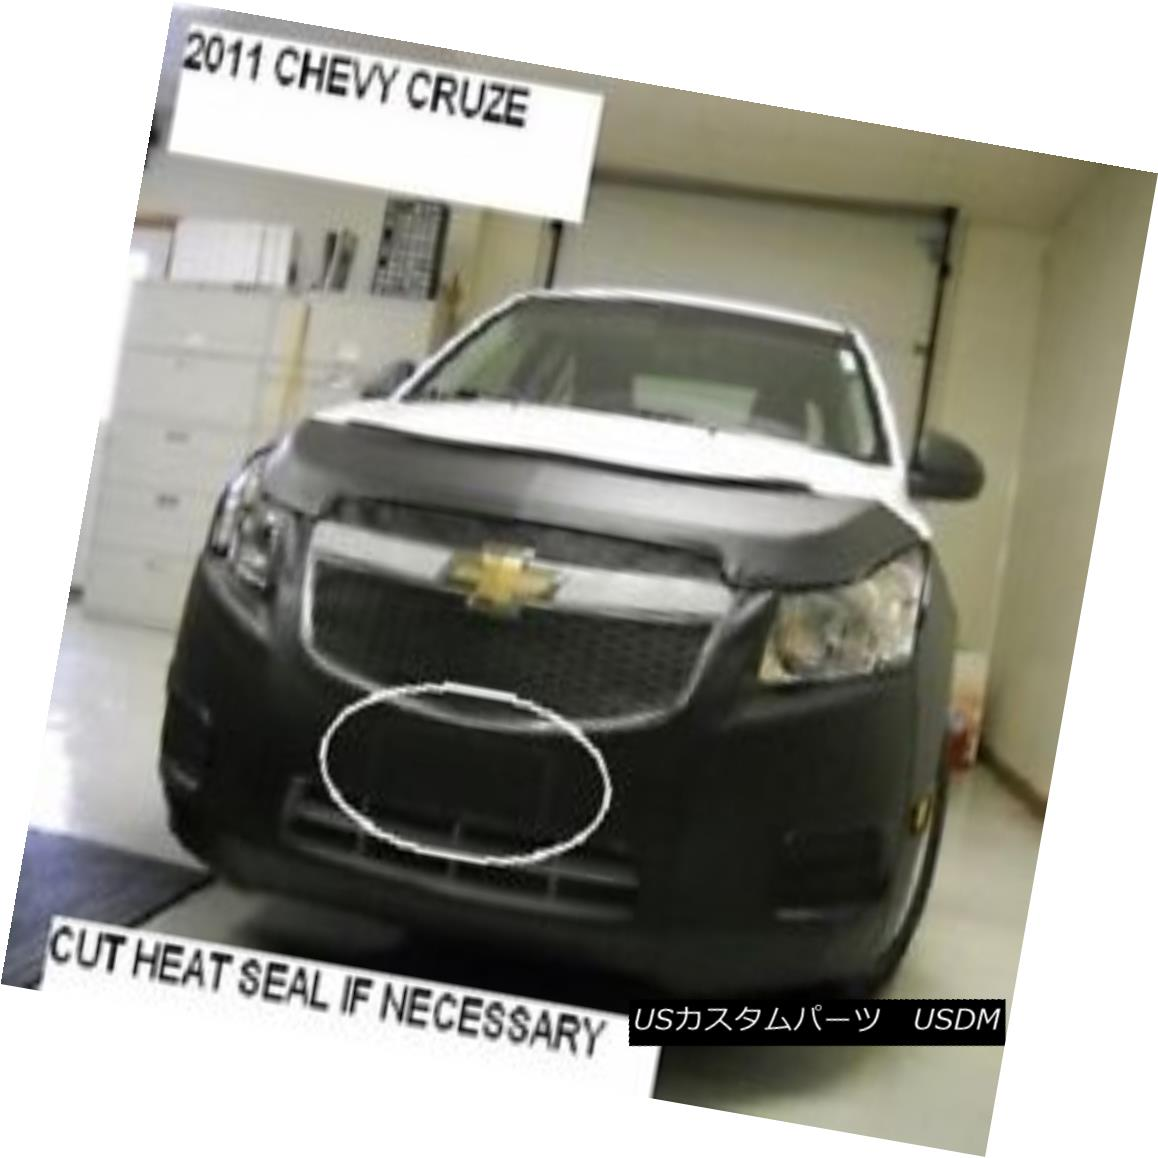 USフルブラ・USノーズブラ Lebra Front End Cover Mask Bra Fits 2011 2012 2013 2014 Chevy Cruze Lebraフロントエンドカバーマスクブラフィット2011 2012 2013 2014 Chevy Cruze